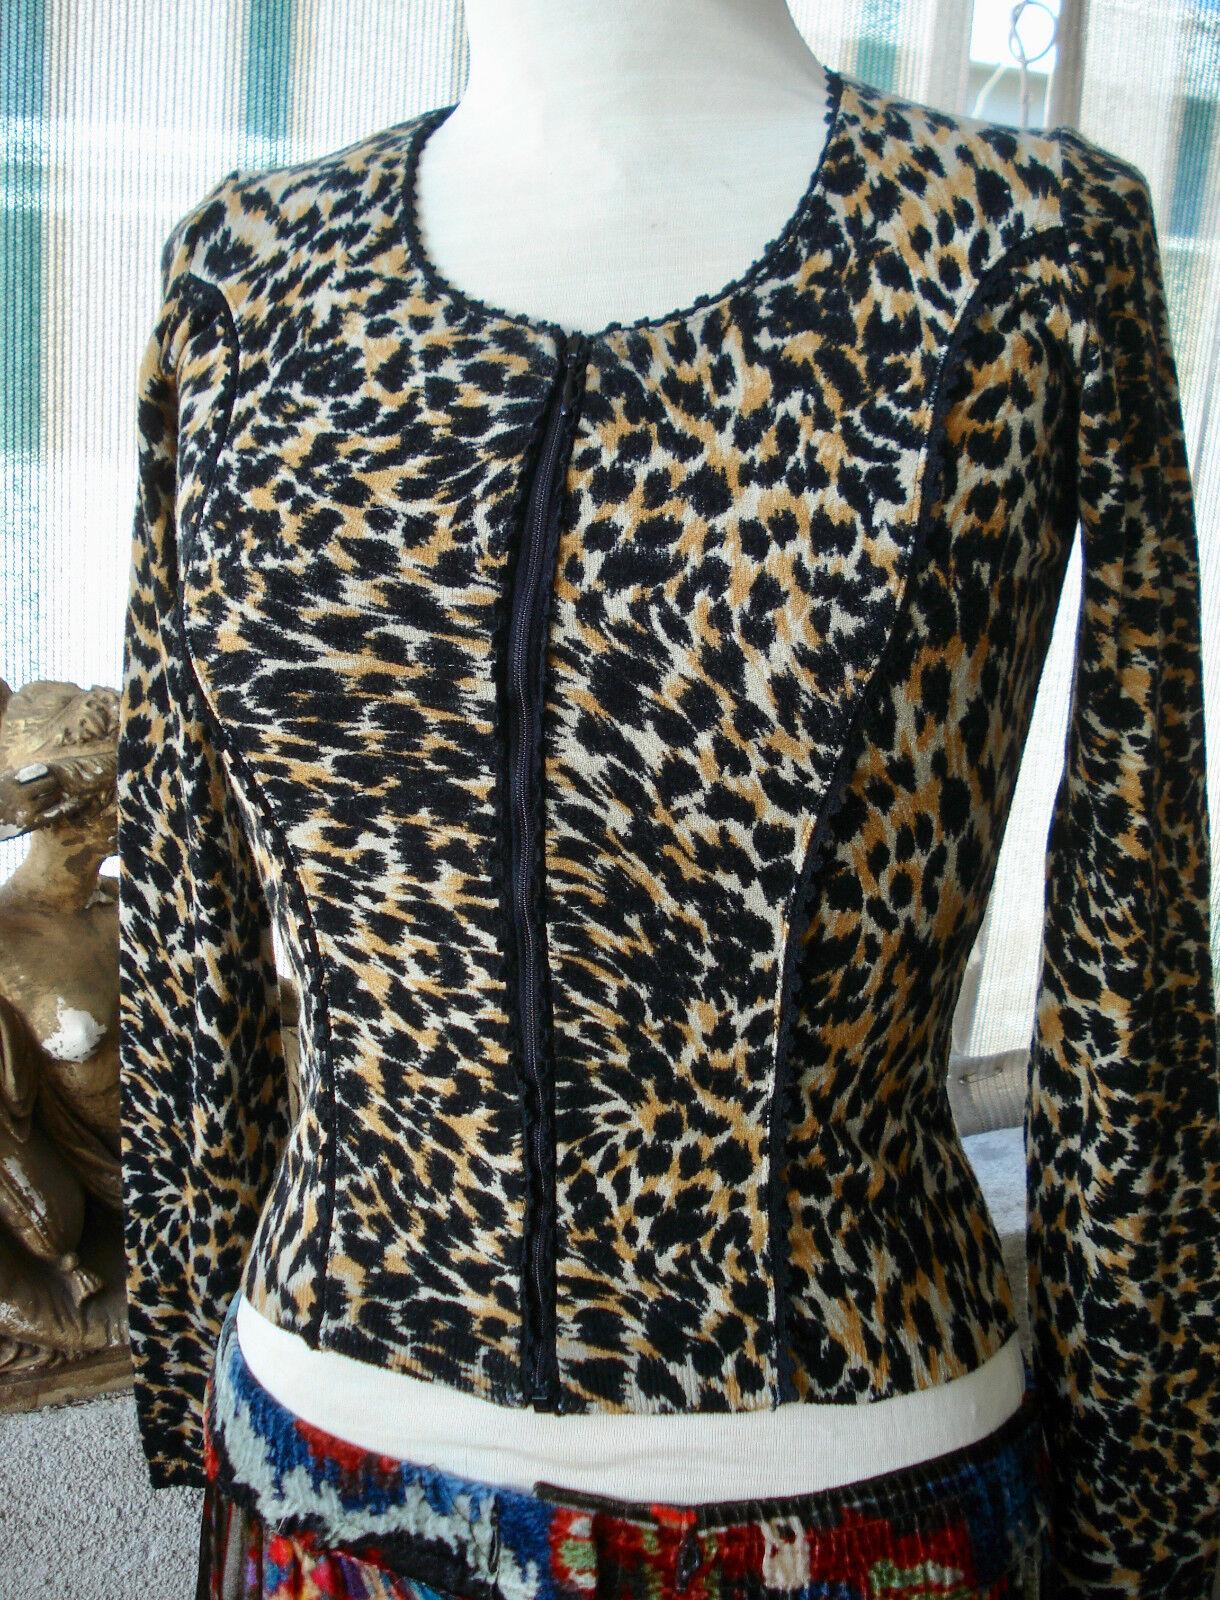 blueMARINE  Animal Print Zipper Cardigan Sweater Sweater Sweater Top  40 133d11